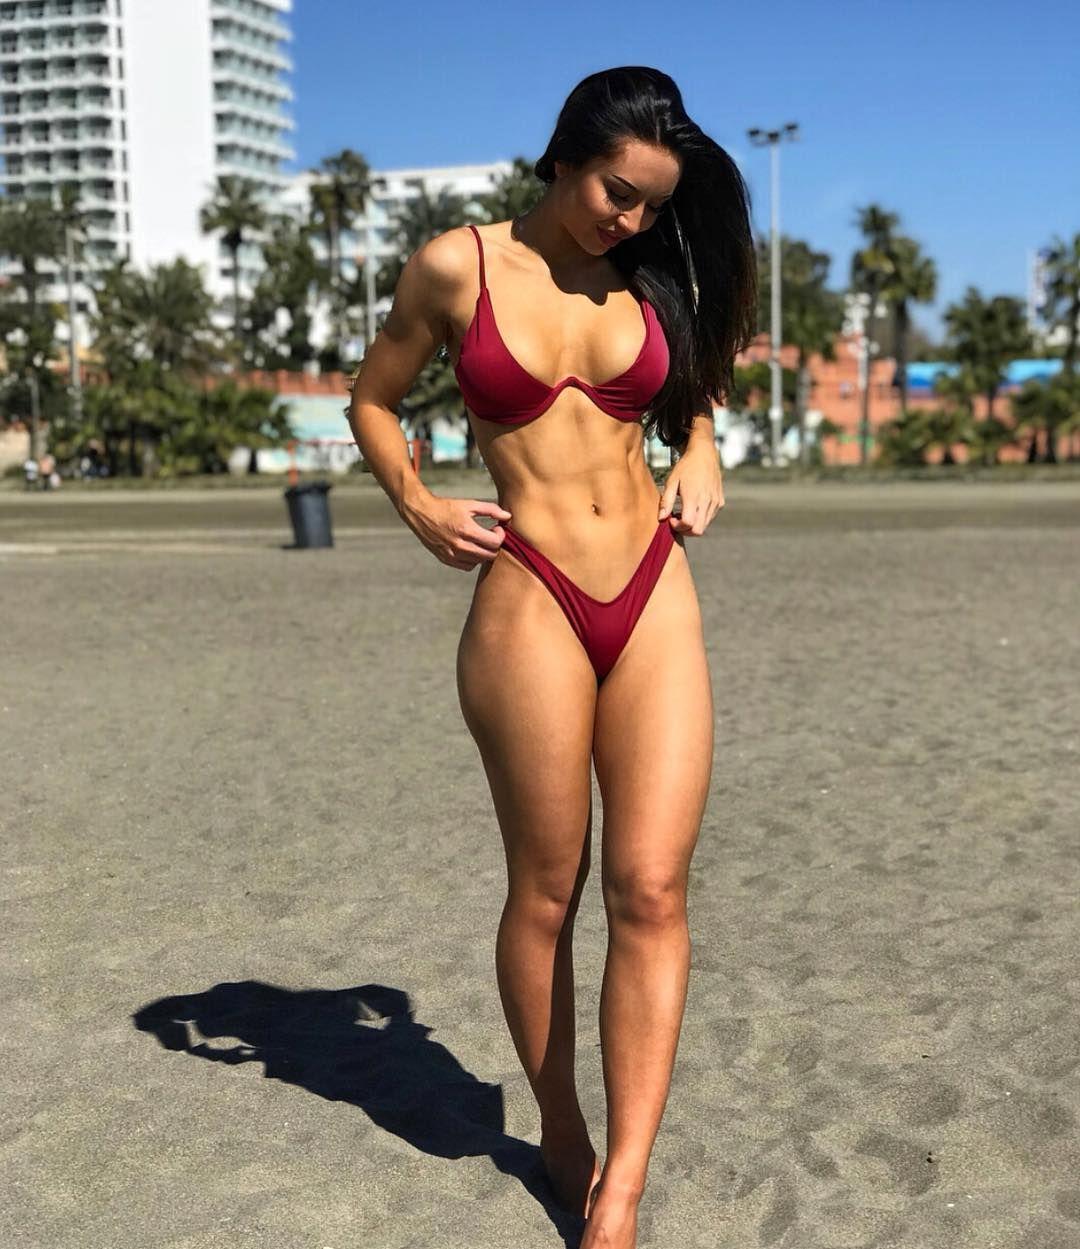 Sanna maria tits nude (54 pics)